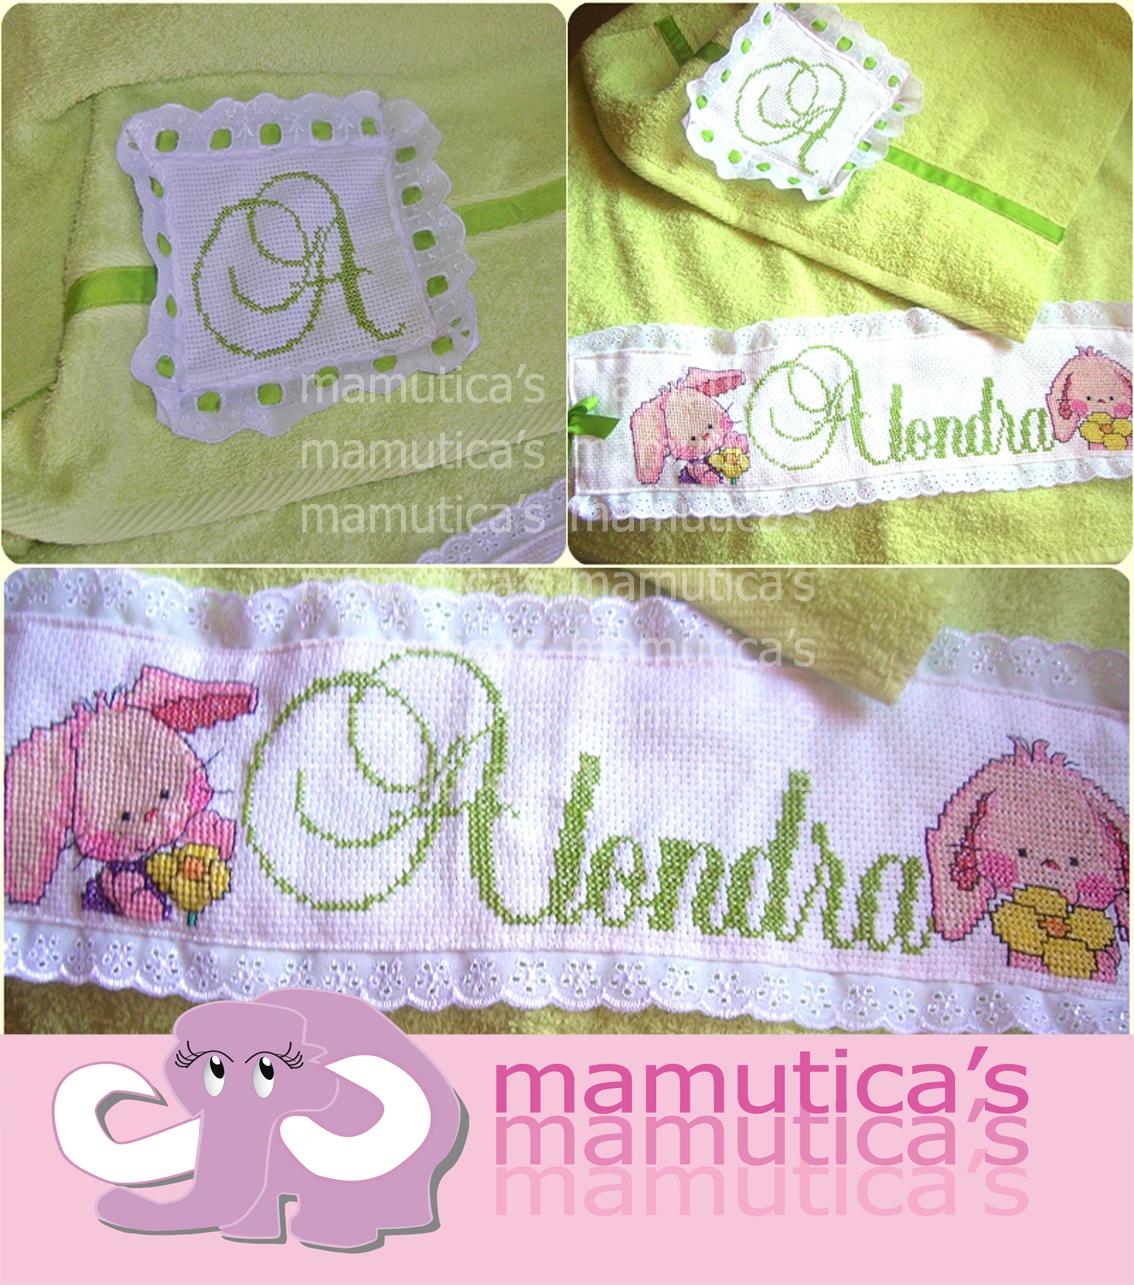 Mamutica 39 s toallas bordadas en punto de cruz - Toallas bano ...